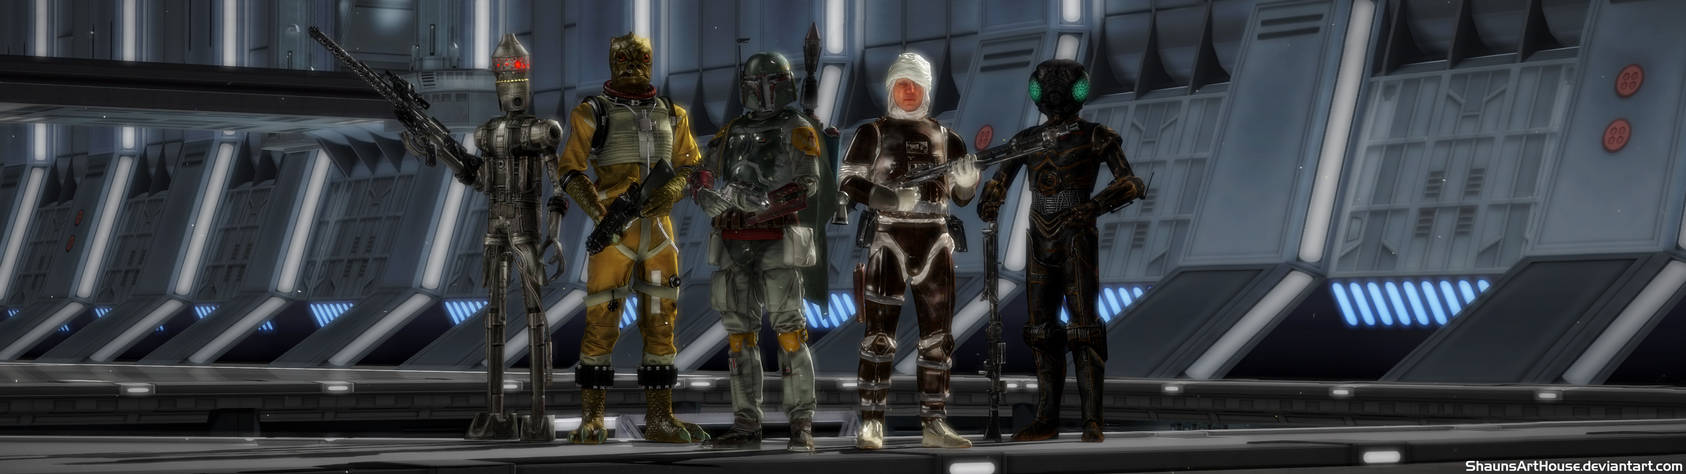 Star Wars Og Bounty Hunters Dual Screen Wallpaper By